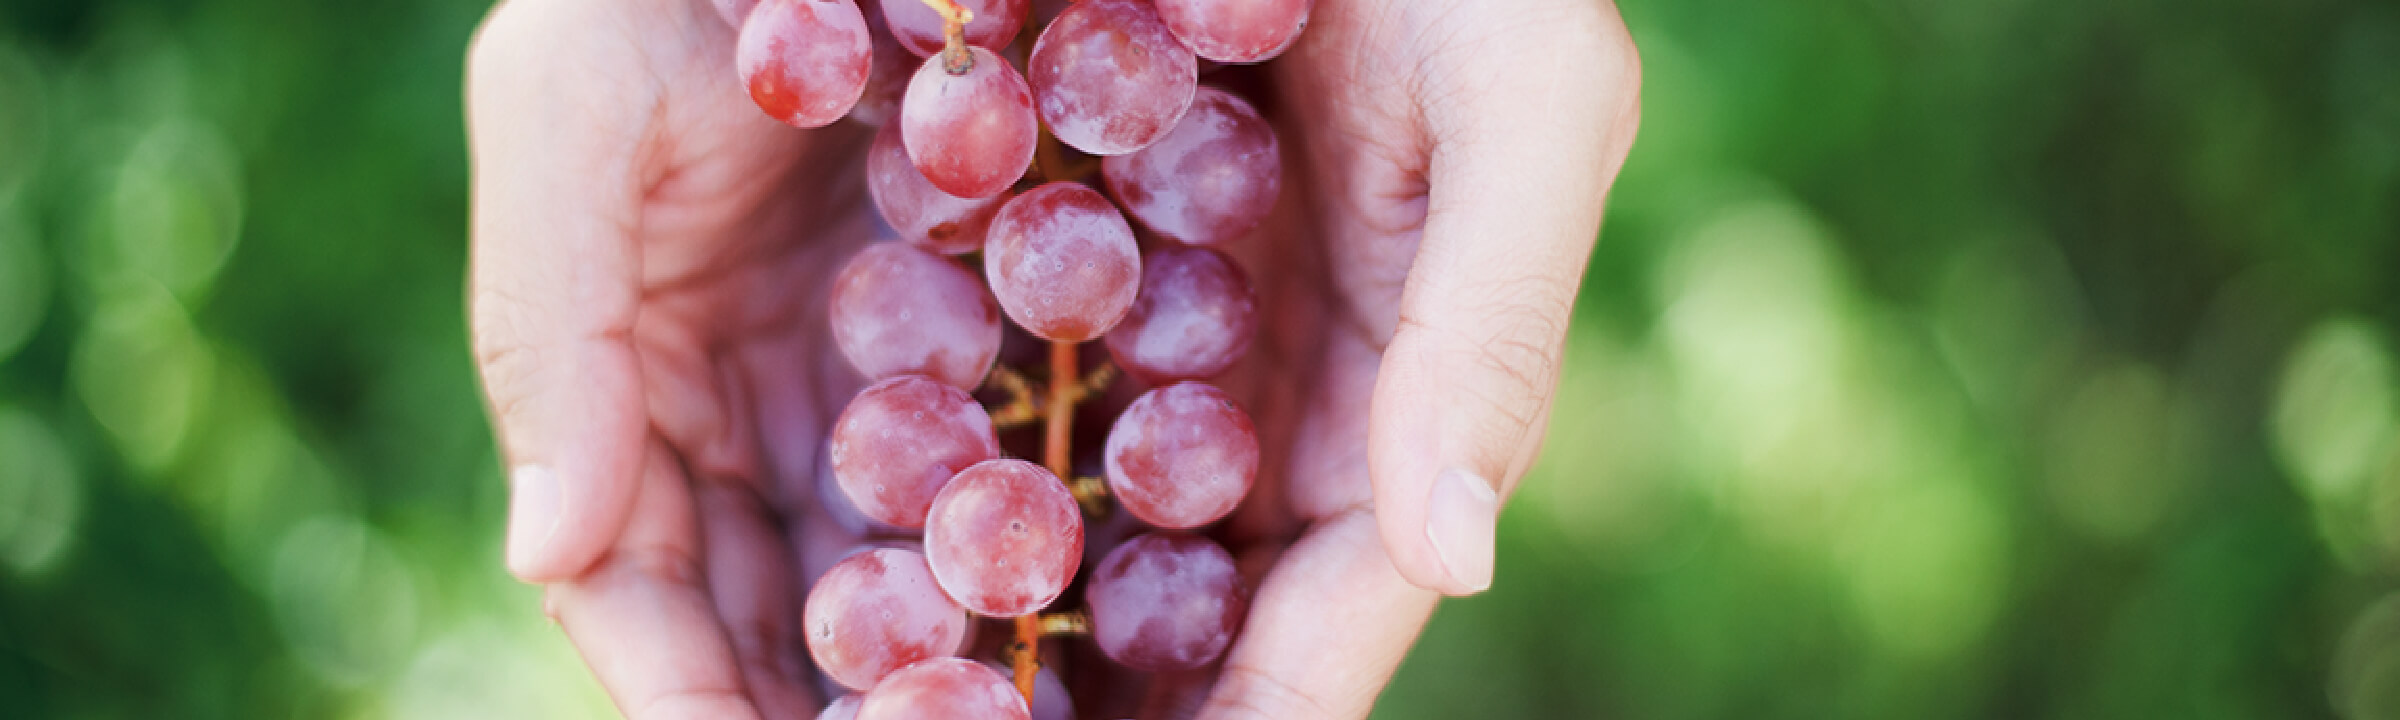 Vine to Wine 自然な味わいのワインを目指して